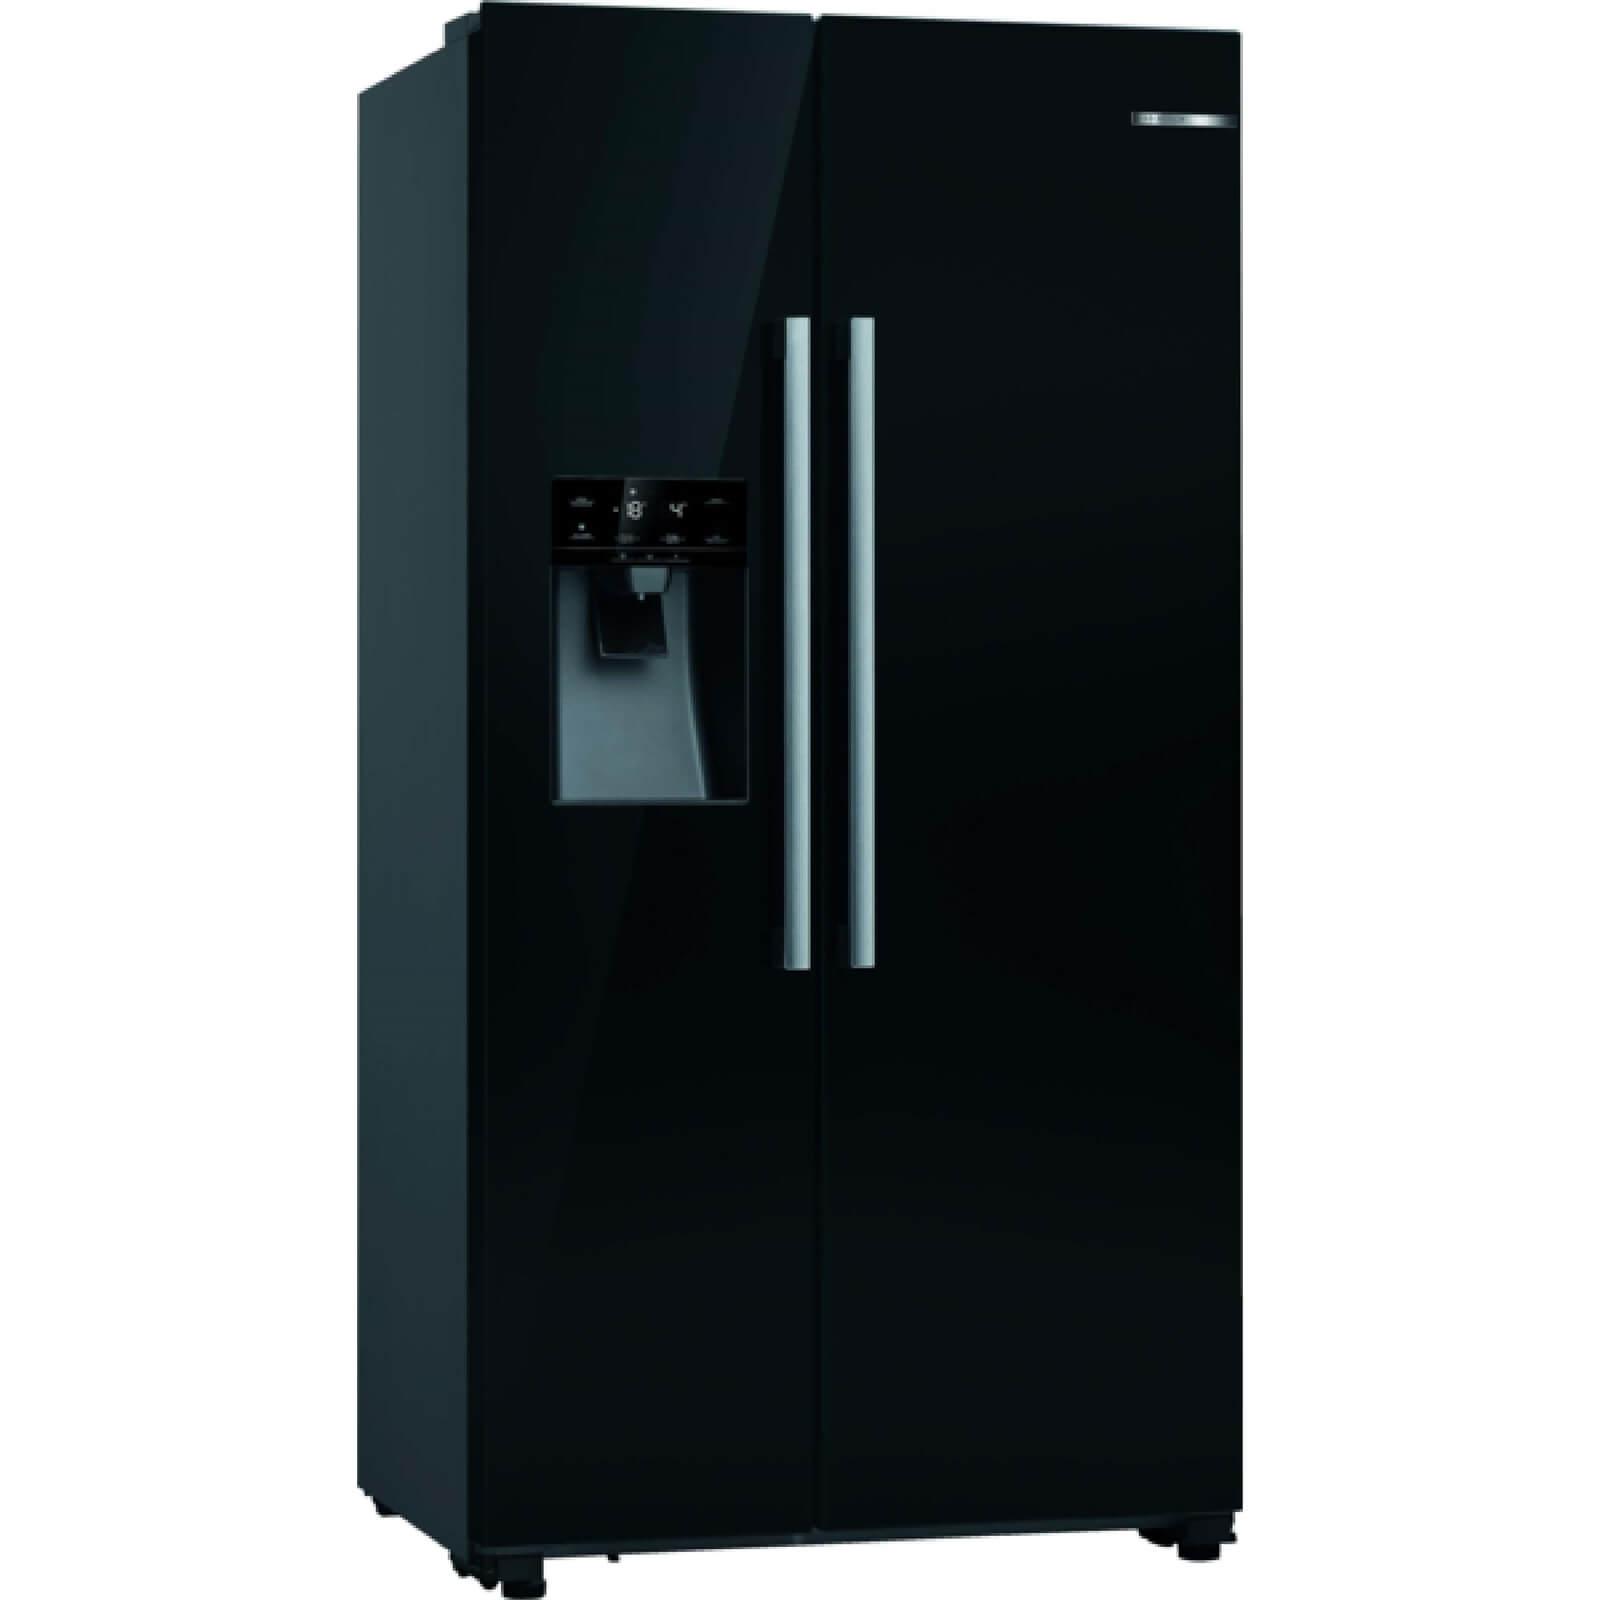 Bosch KAD93VBFPG Black American Side By Side Fridge Freezer